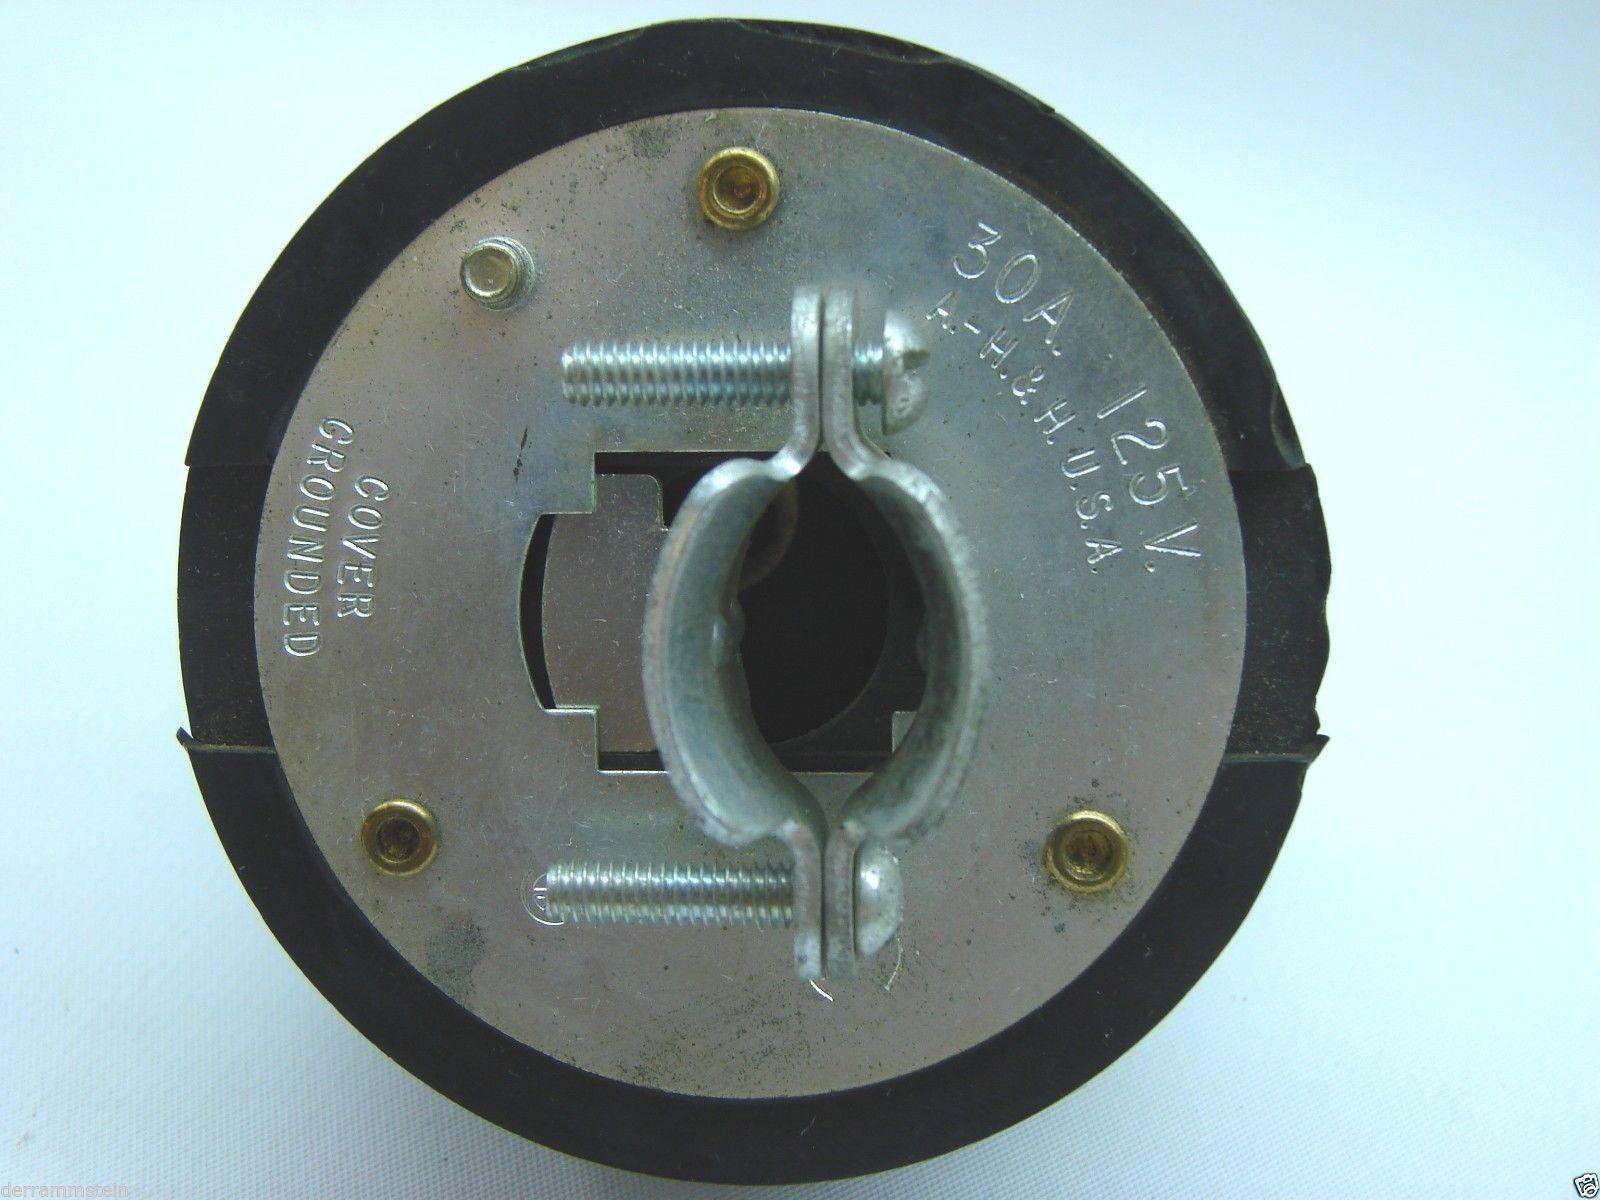 Hubbell Vintage 2 Pole 3 Wire 125 Volt 30 Amp AC Plug t8